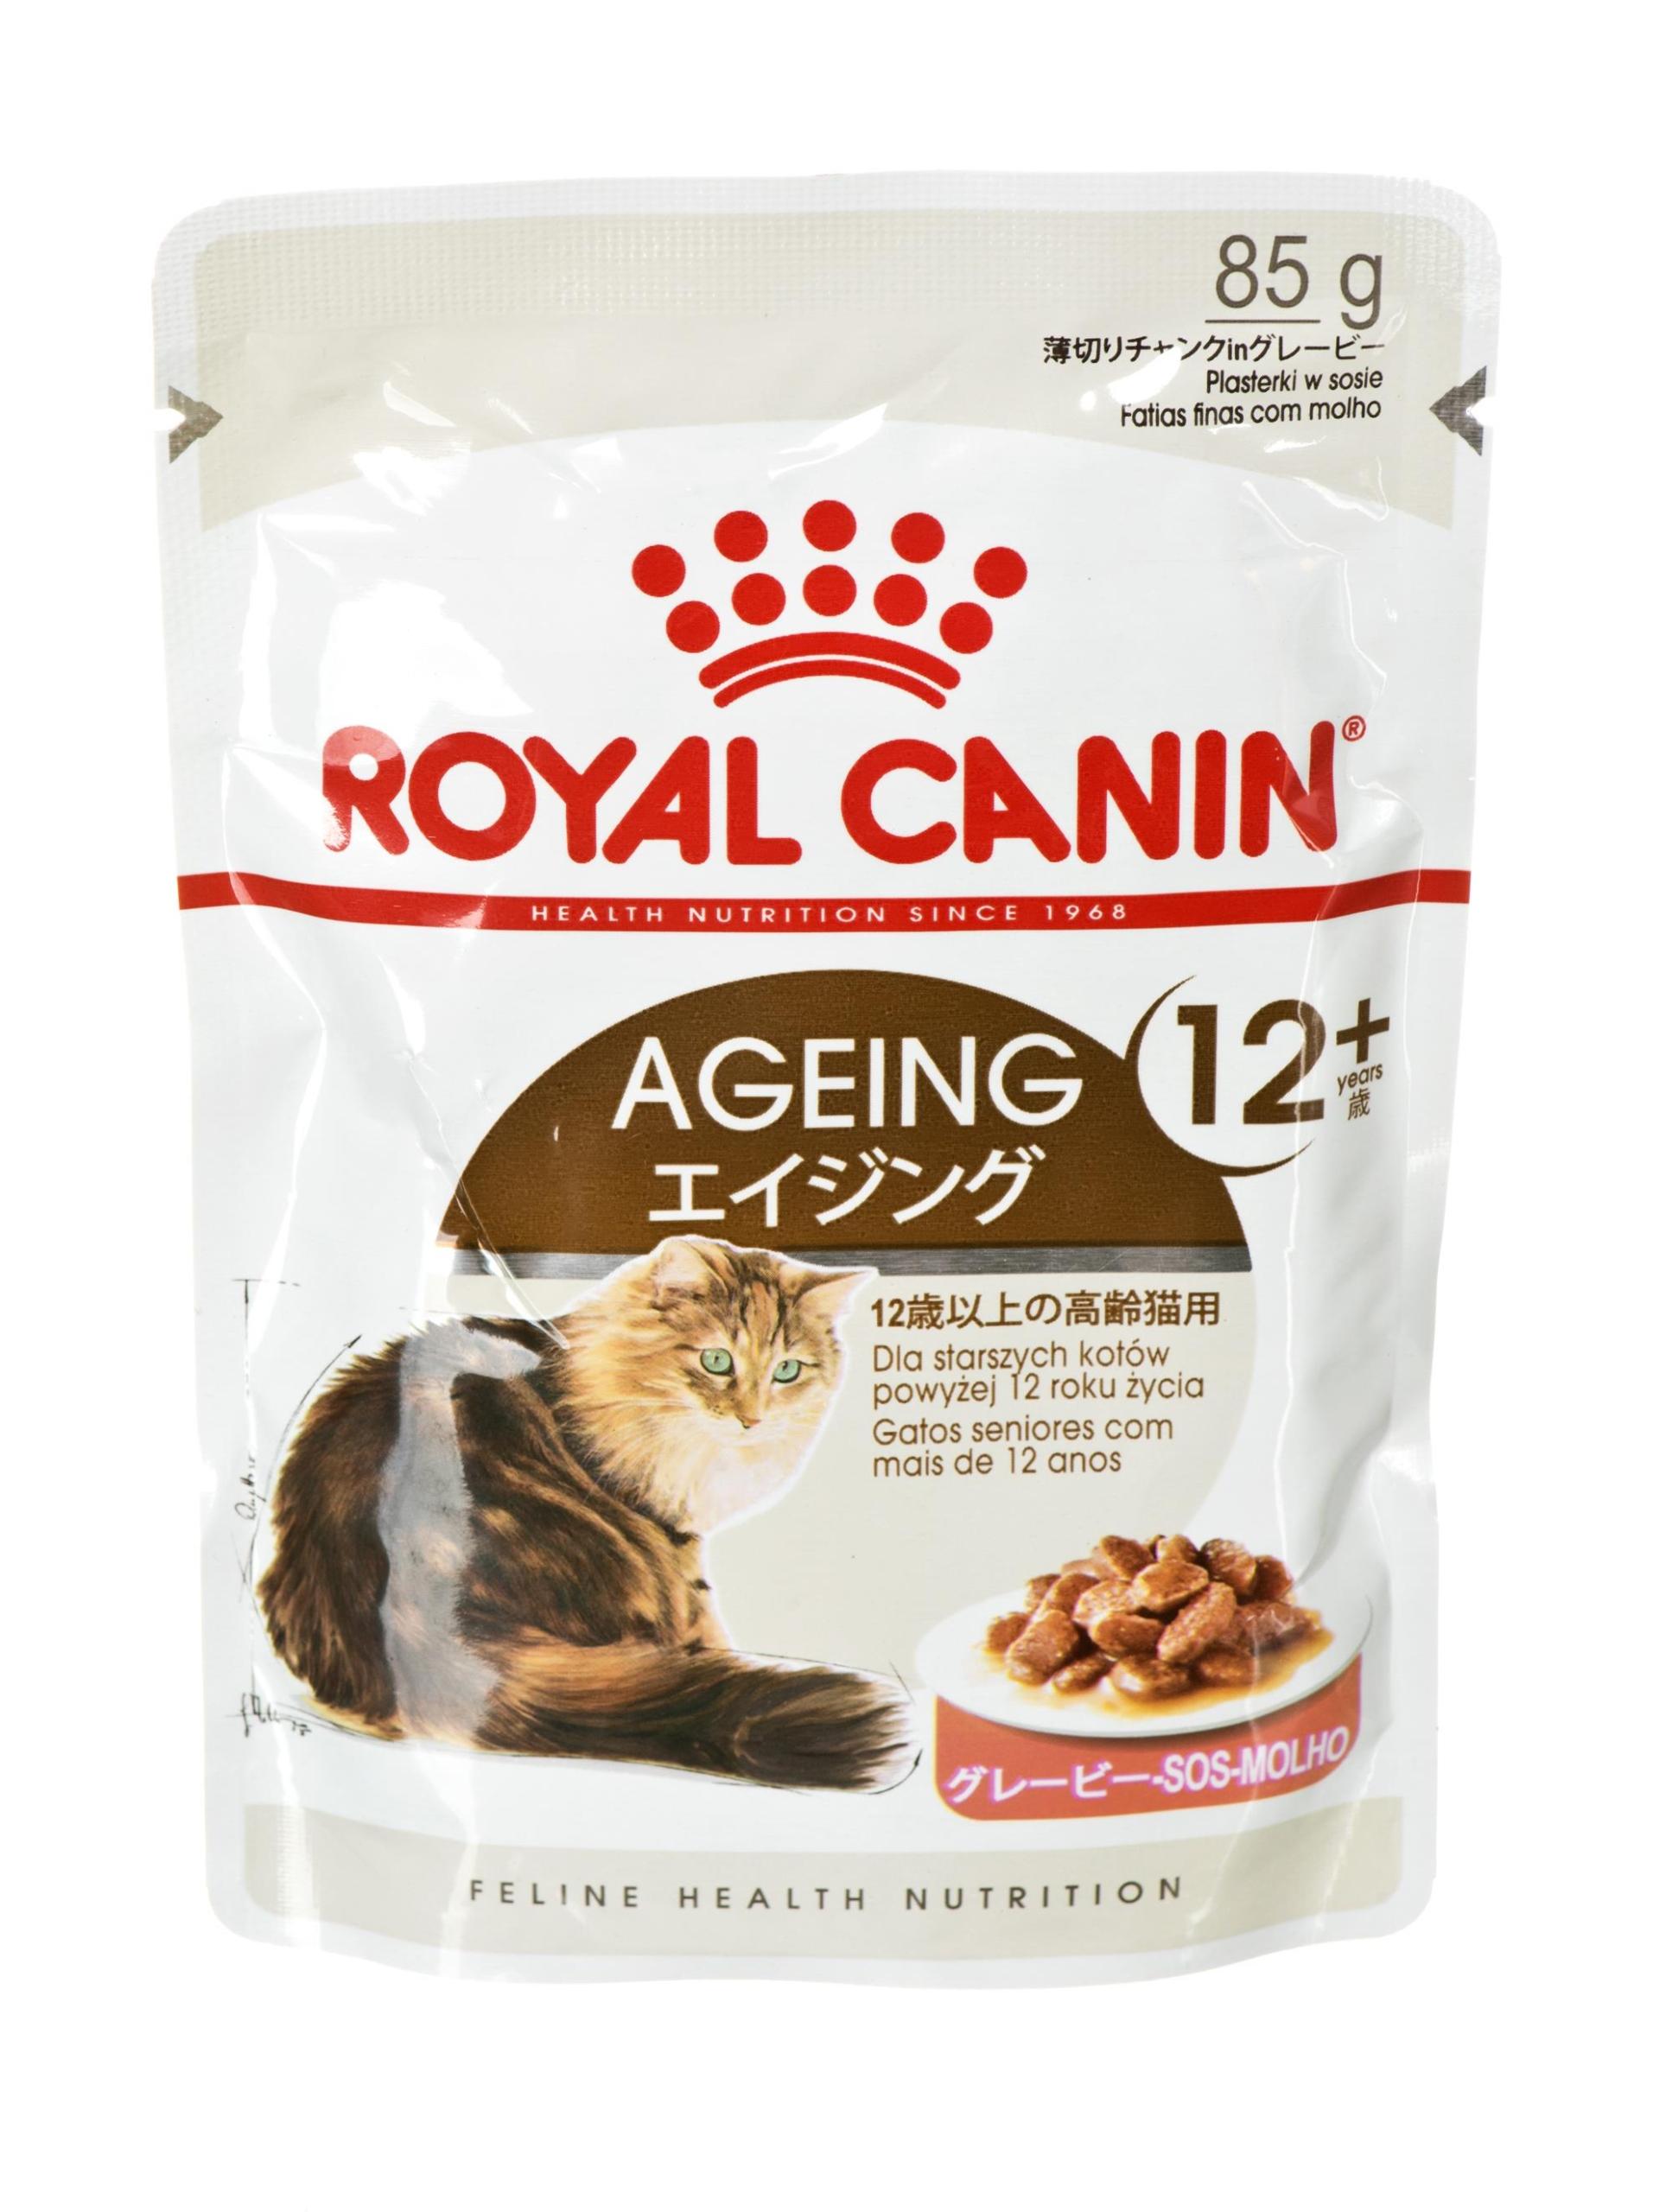 Royal Canin Karma Royal Canin Ageing +12 - 85g